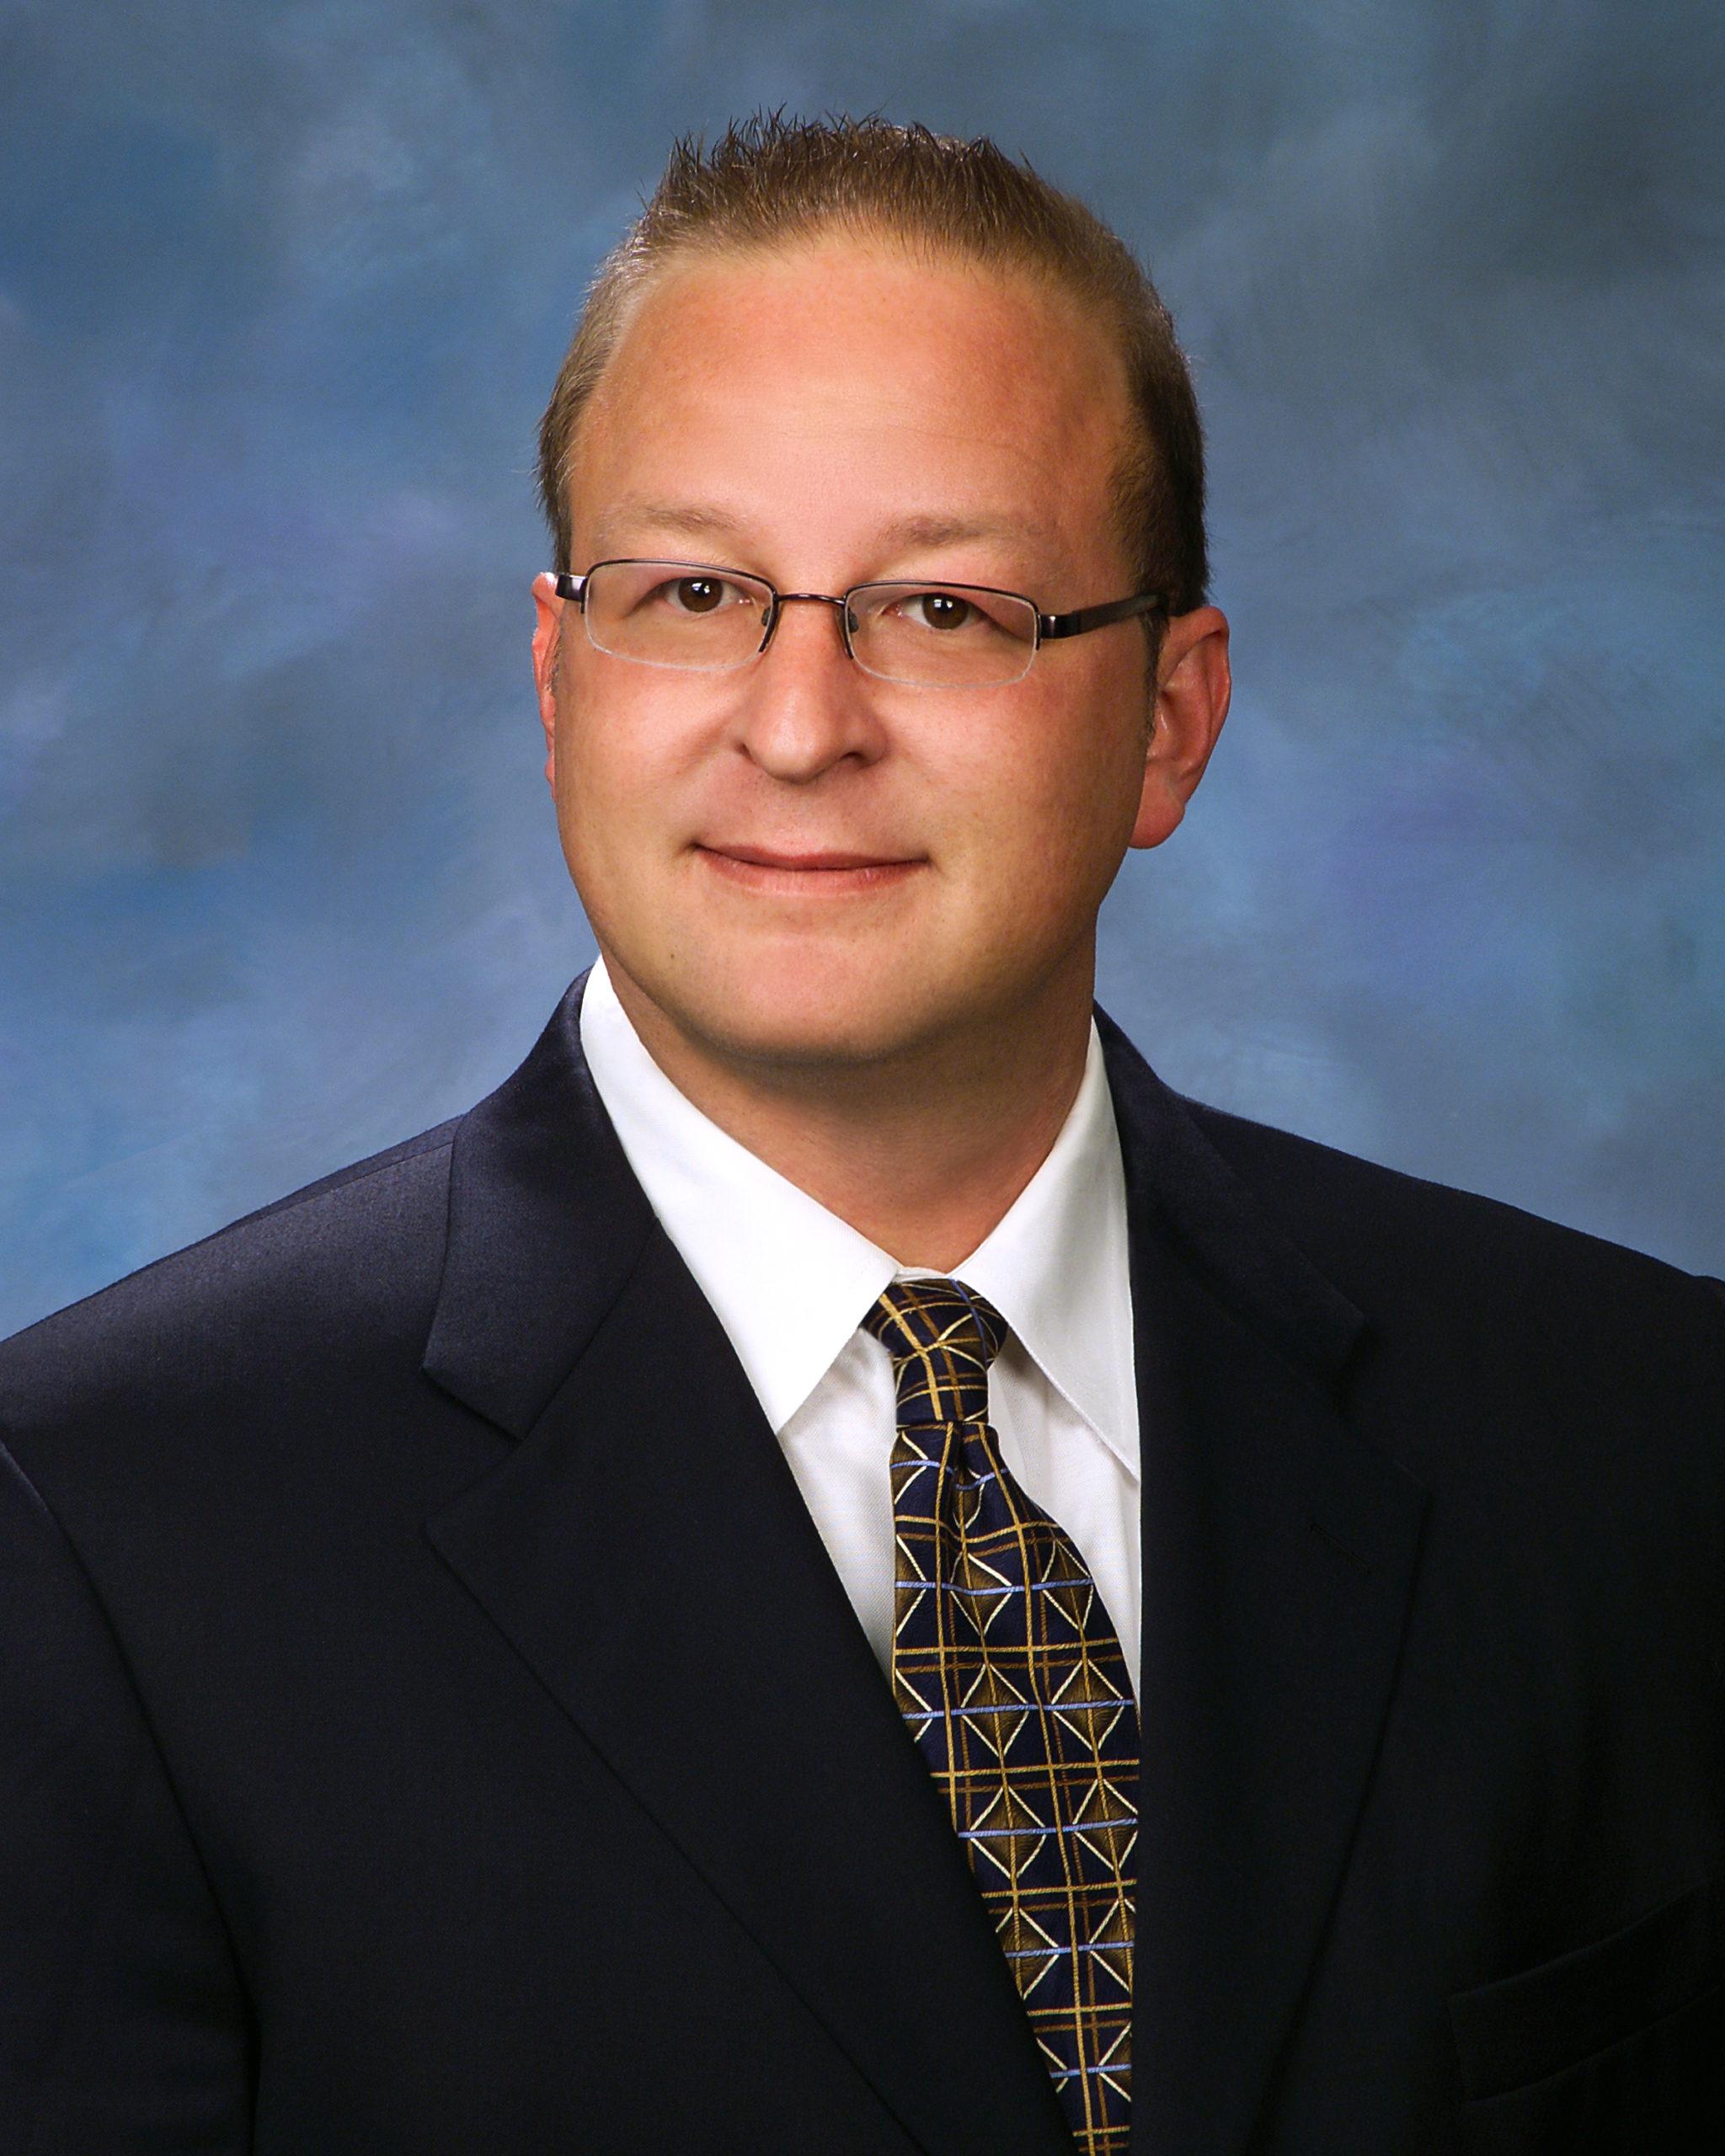 Douglas Dompkowski